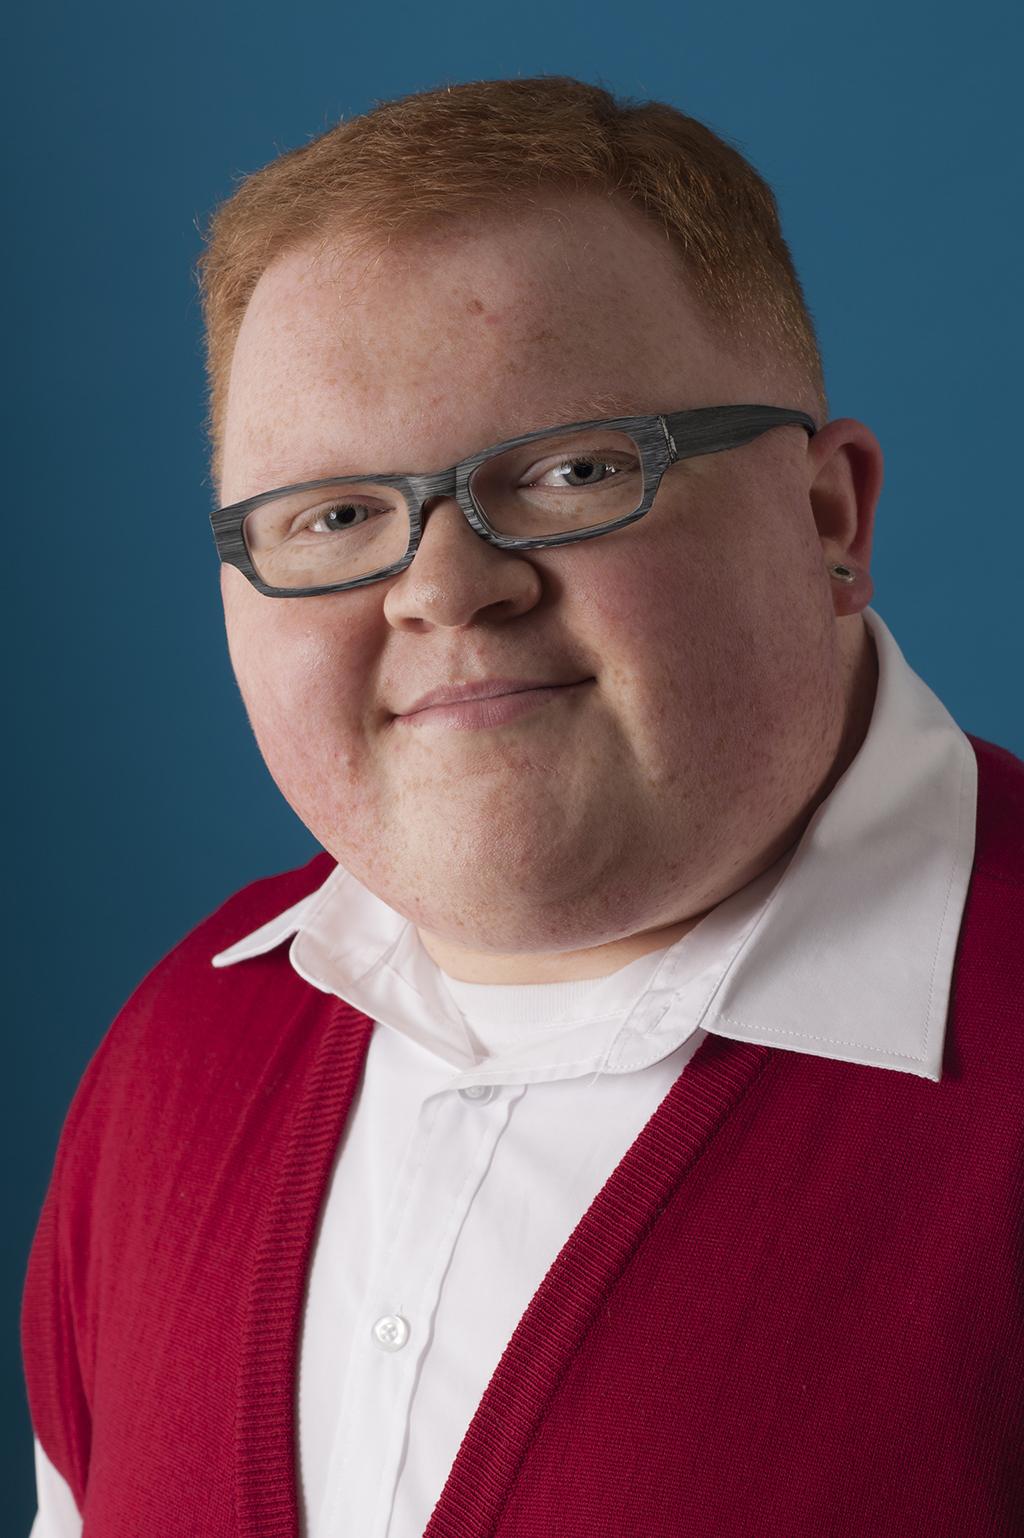 Christian Schließmann (SPD), Behindertenbeauftragter der Stadt Bad Salzungen